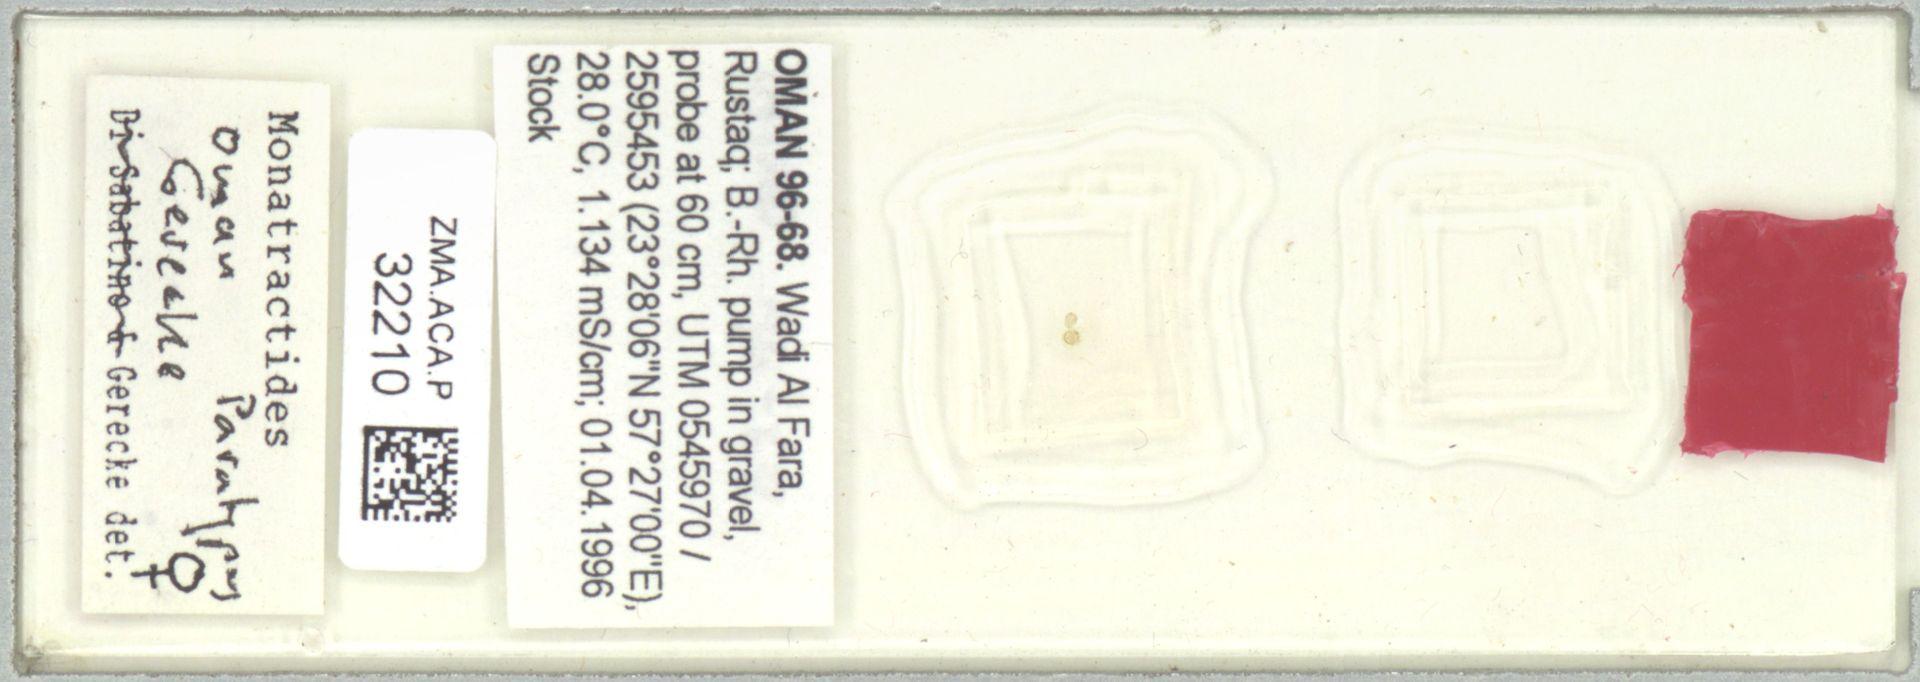 ZMA.ACA.P.32210 | Monotractides